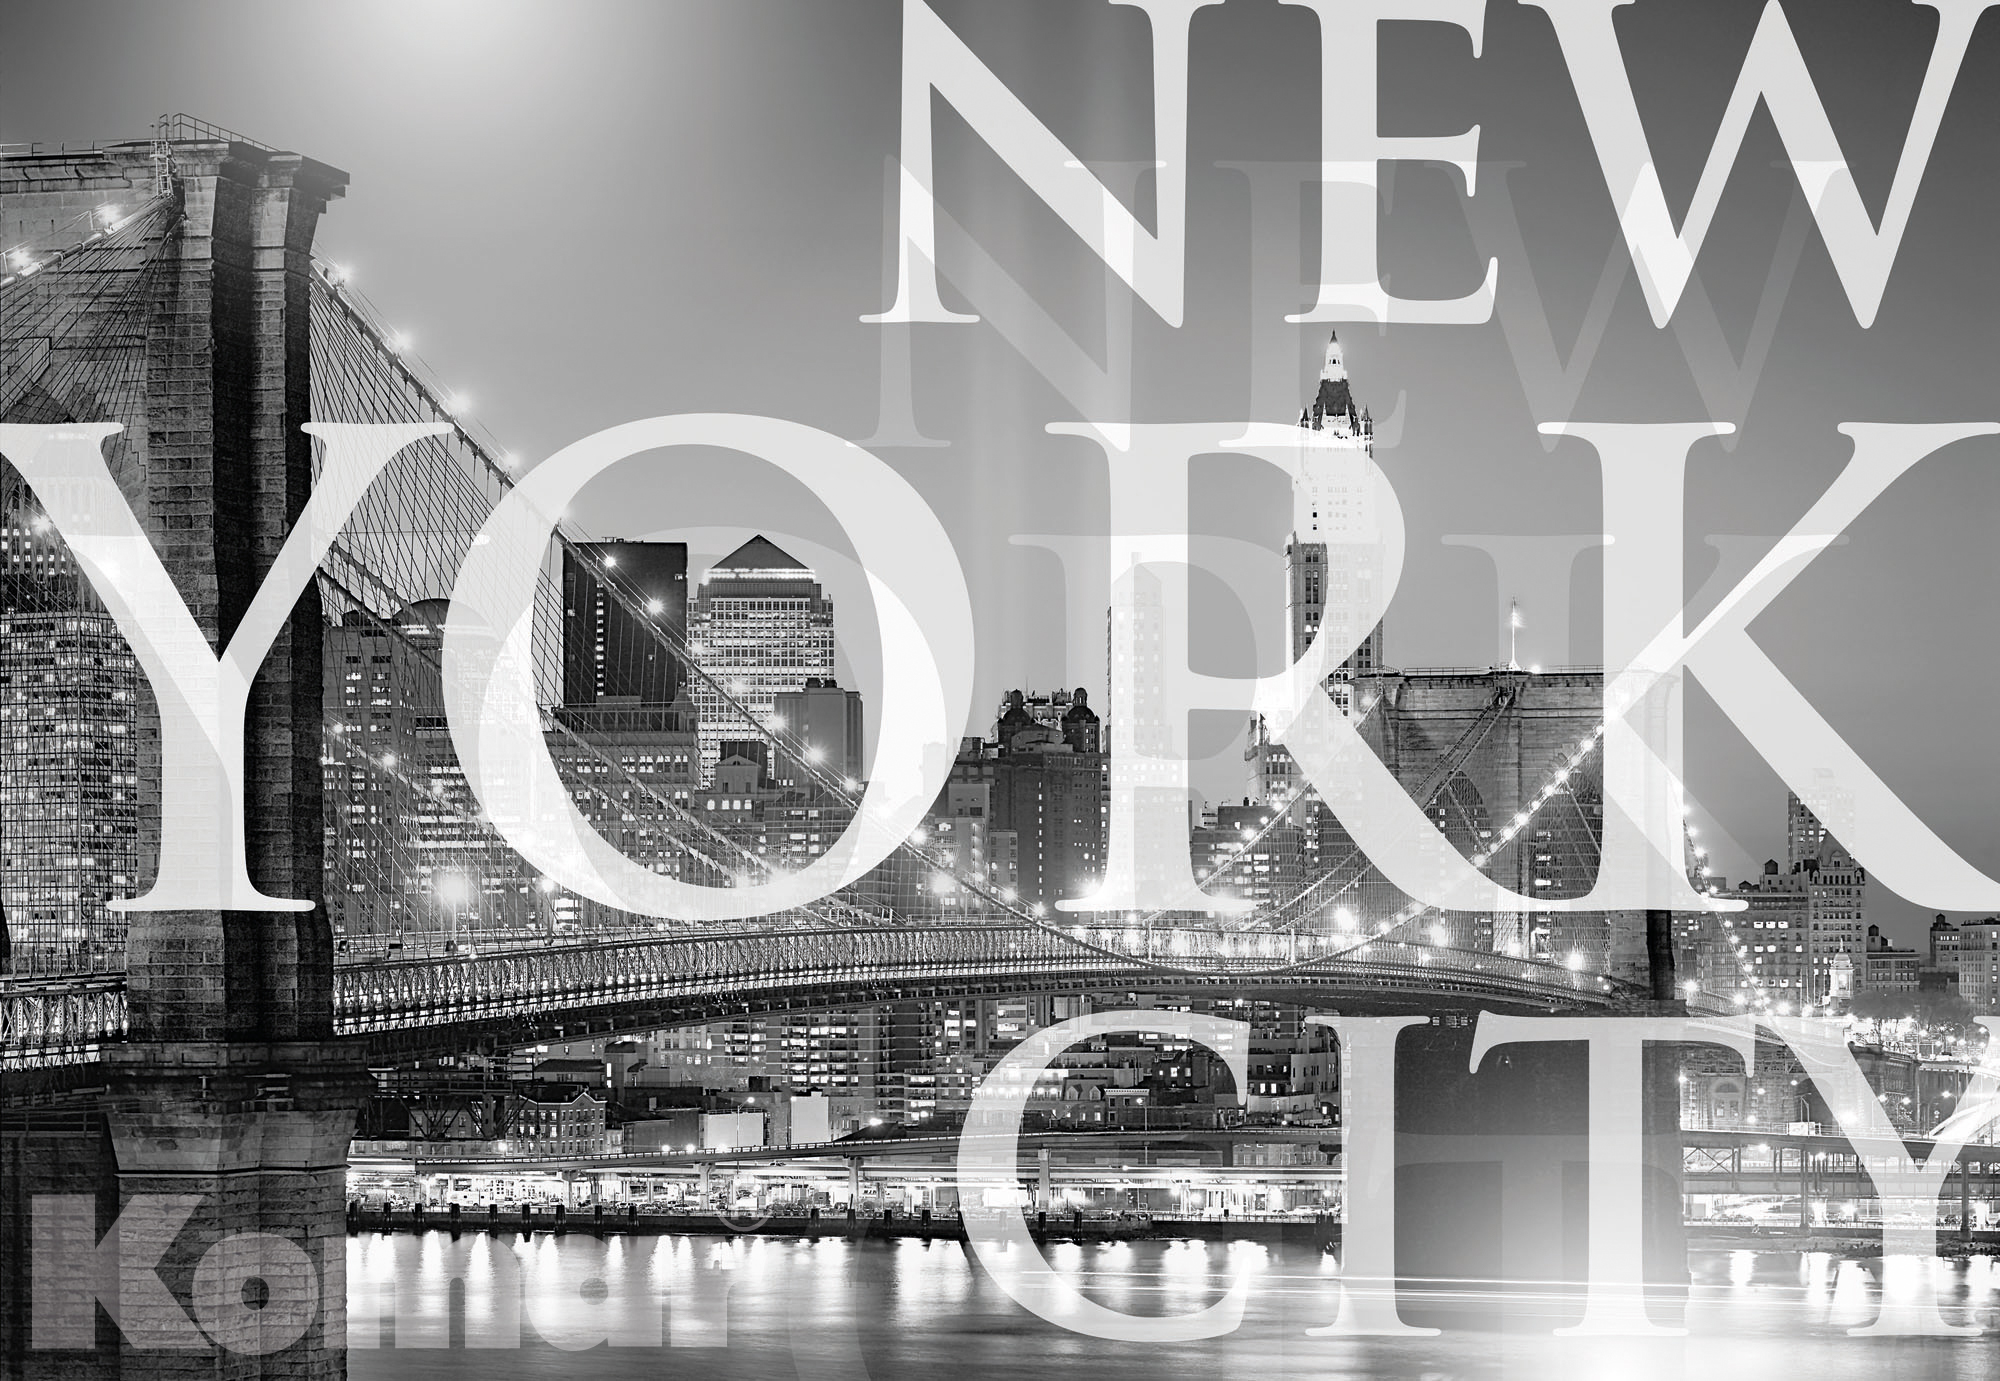 kiss fototapeten zu besten preisen fototapete gallery new york city 184x127 usa brooklyn. Black Bedroom Furniture Sets. Home Design Ideas